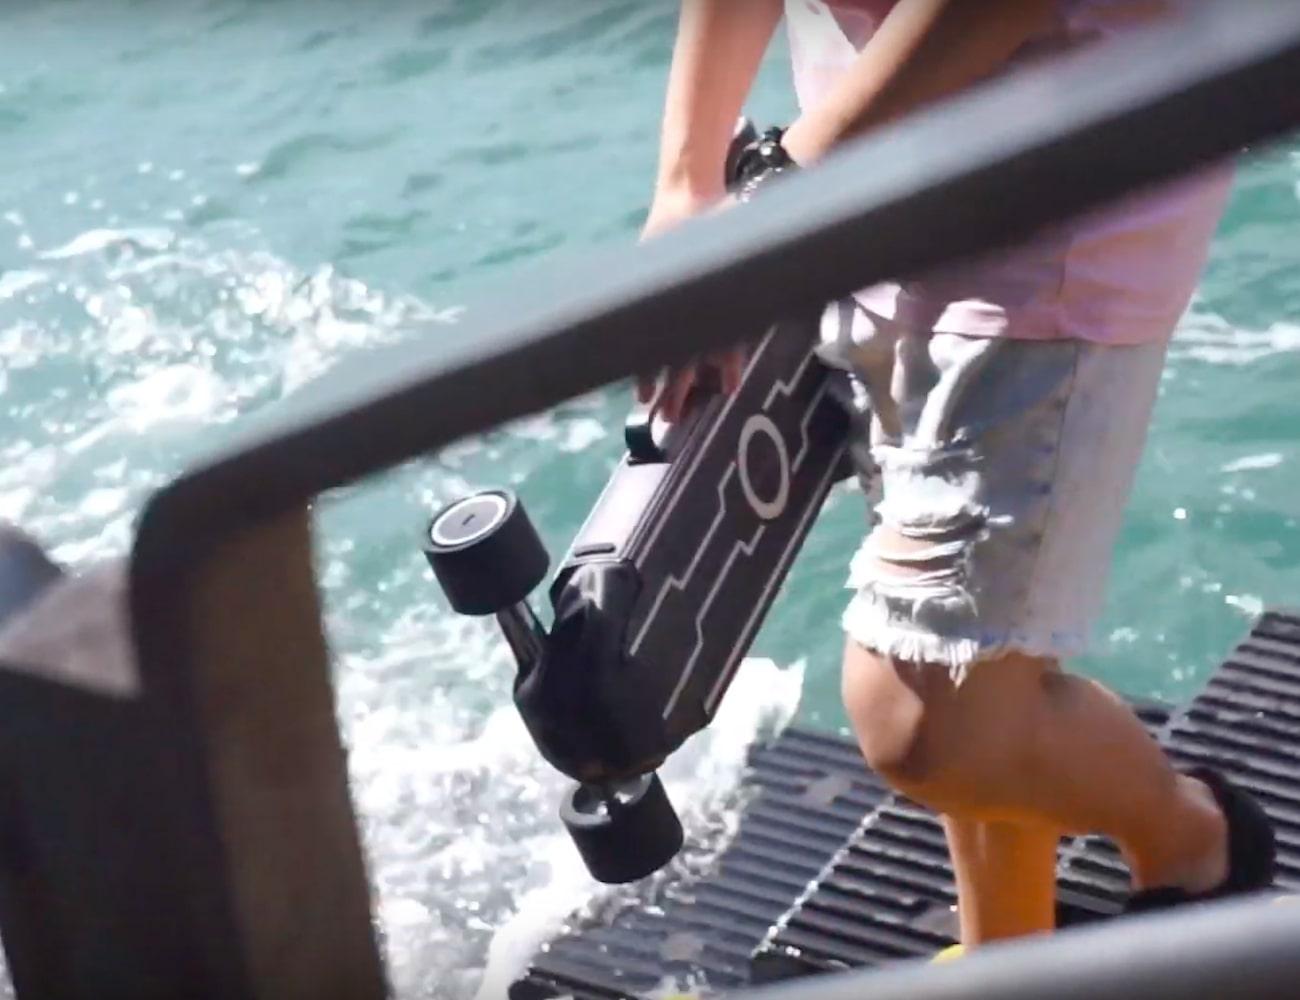 Zetazs Mini Electric Skateboard lets you commute in style